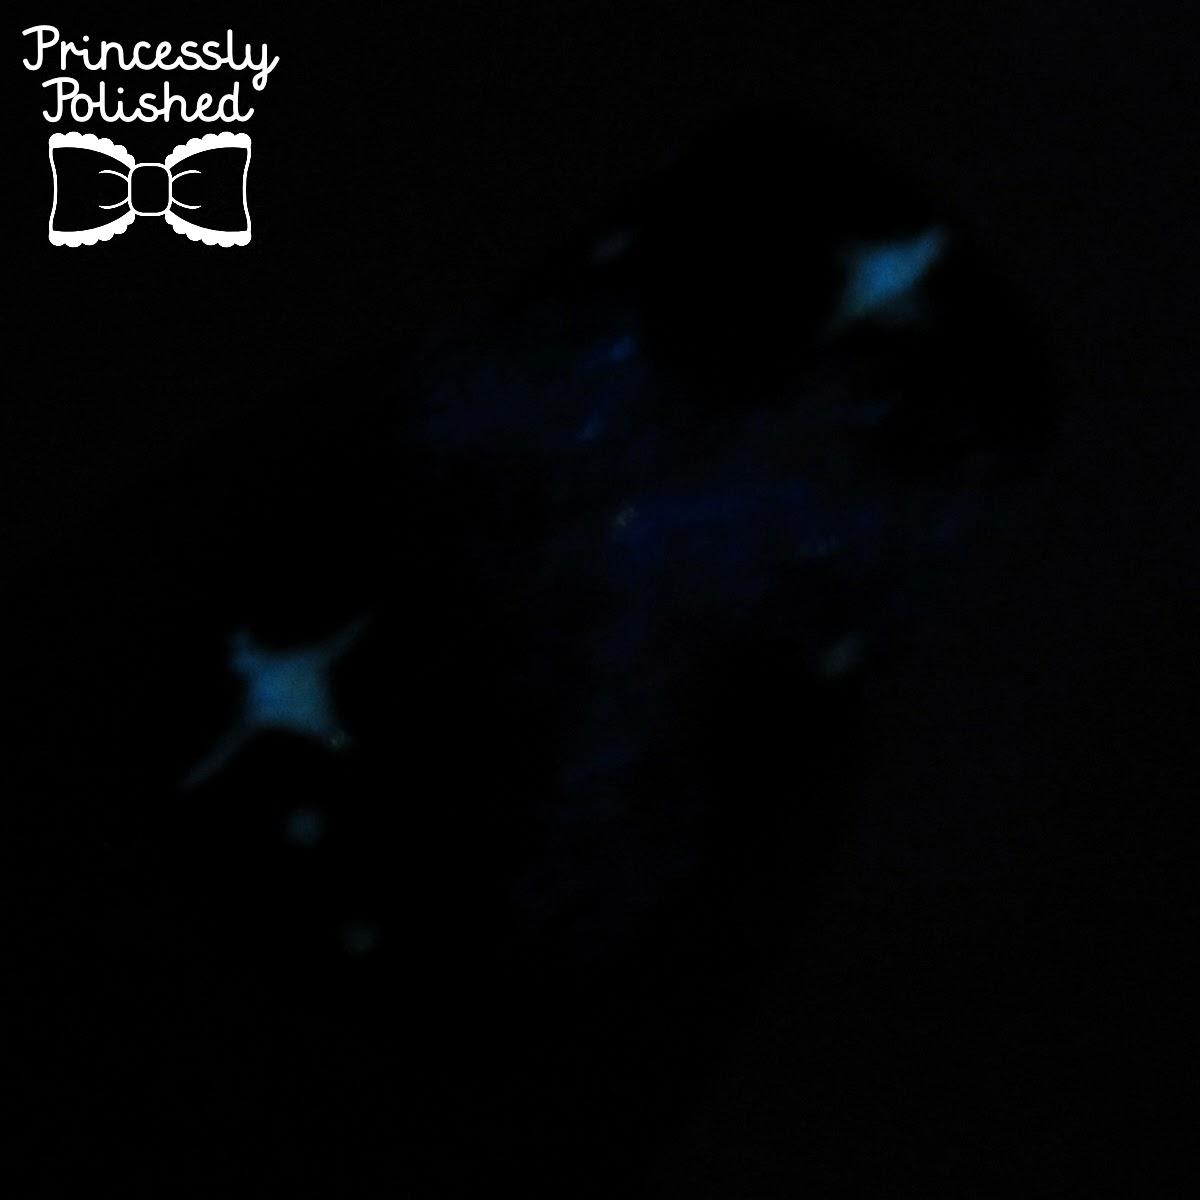 princessly polished glowinthedark galaxy manicure